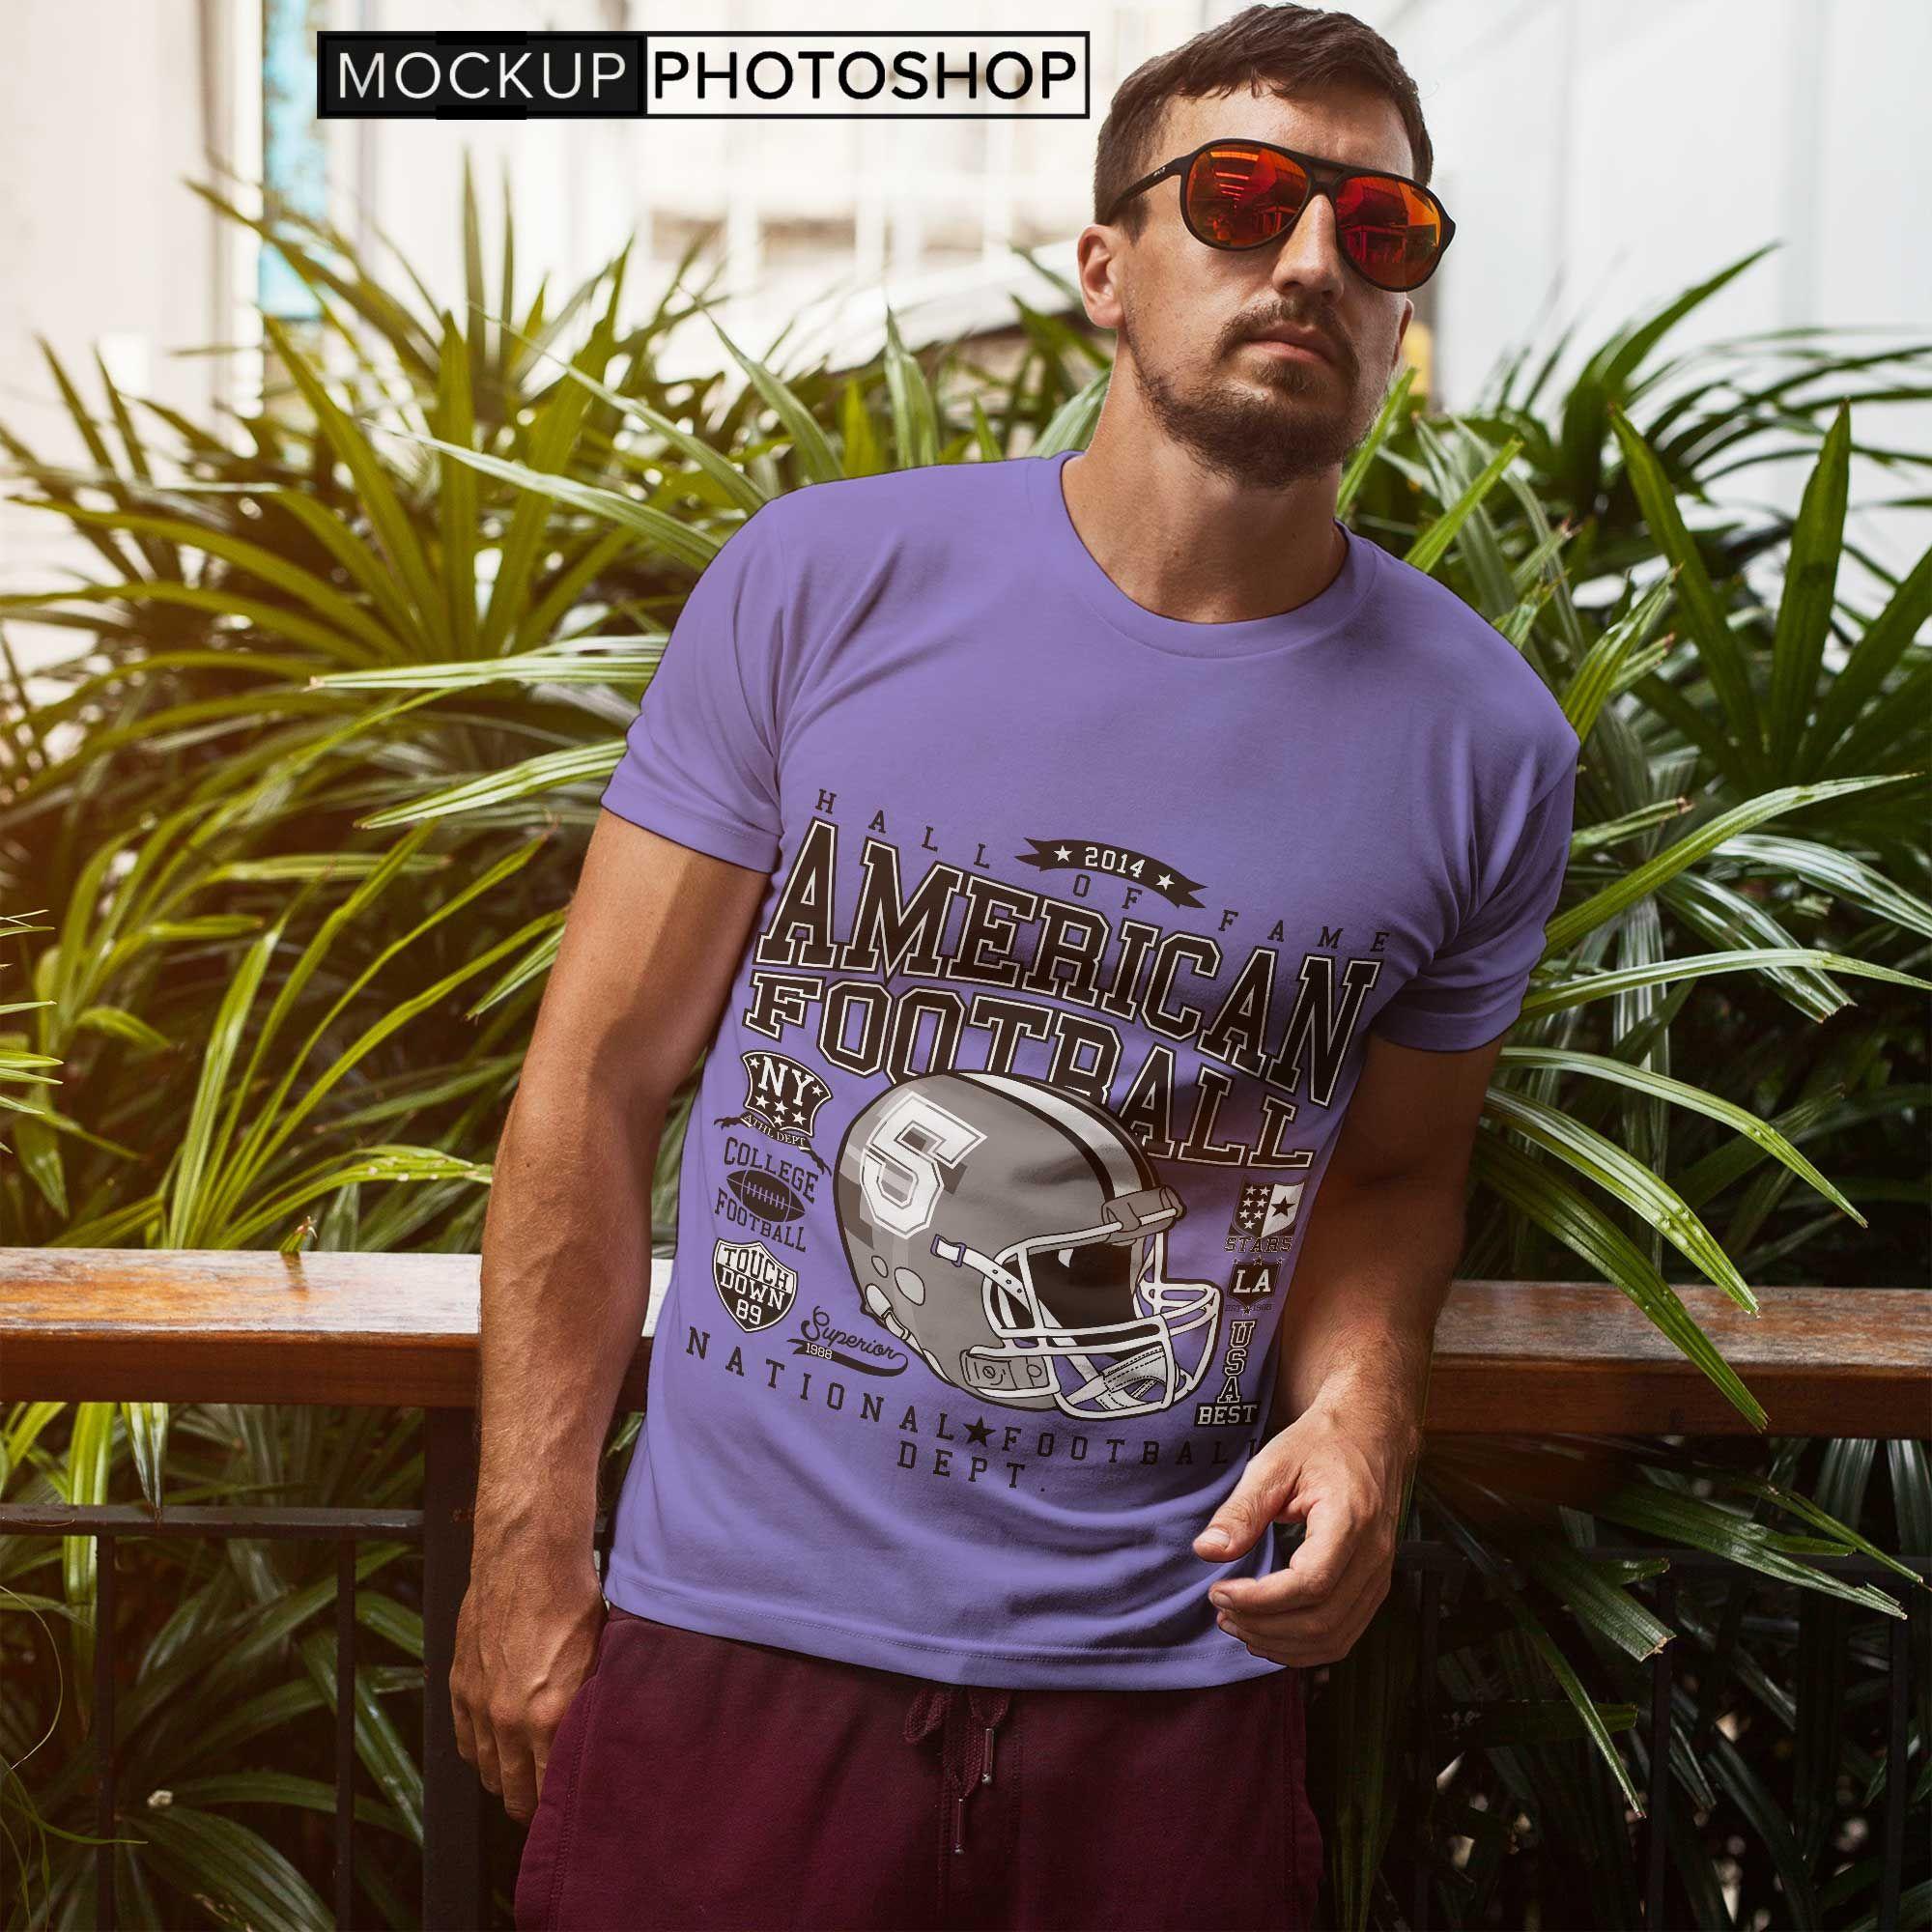 Download Now Showcase Your Logo Designs In A More Professional Way Using These Psd New Man T Shirt Mockup Templates Sh Logo Design Mockup Shirt Mockup Free Logo Mockup